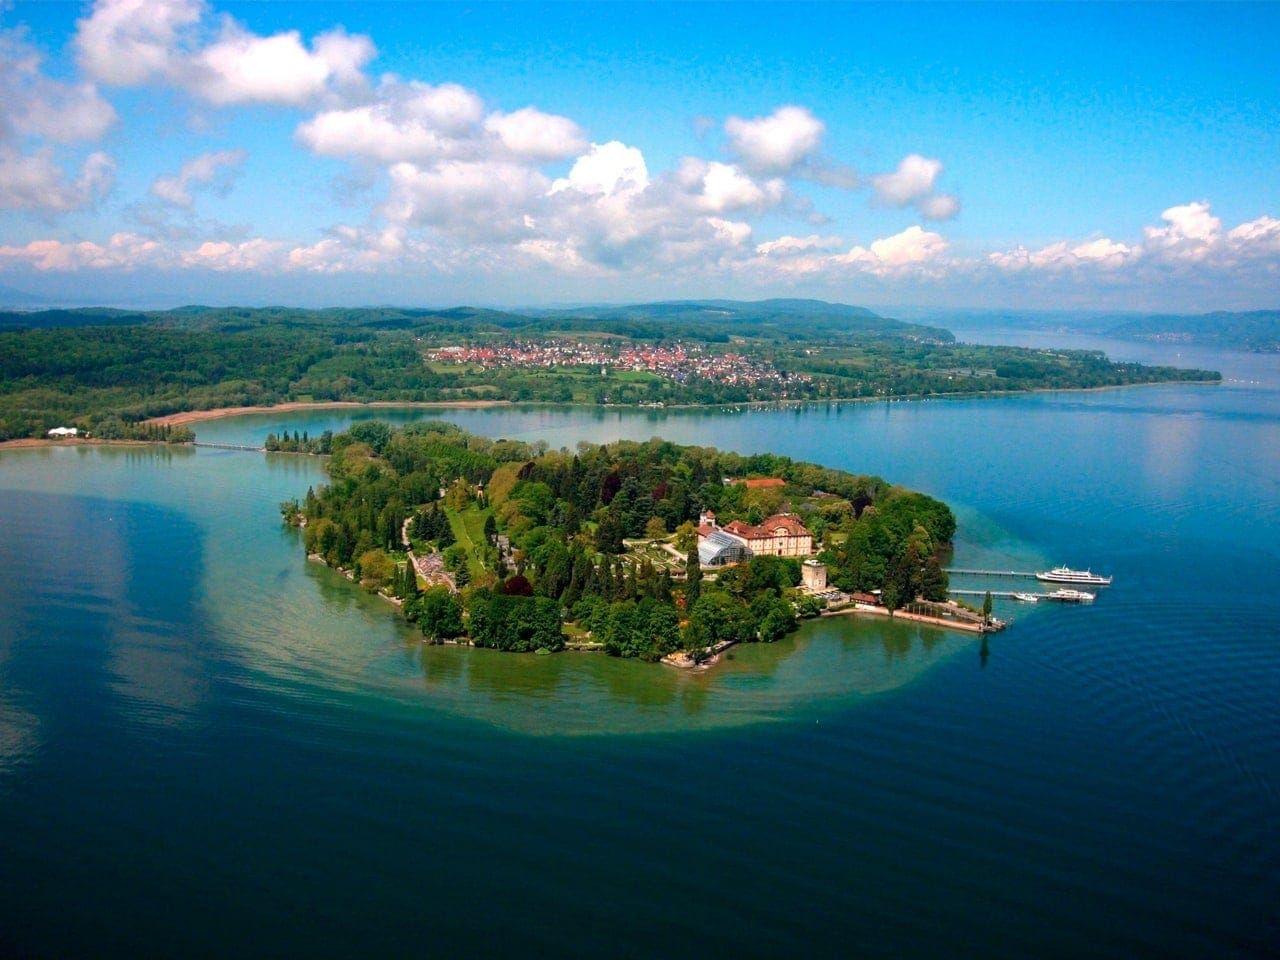 Ausflug: Blütenzeit Insel Mainau – Gruppenausflug